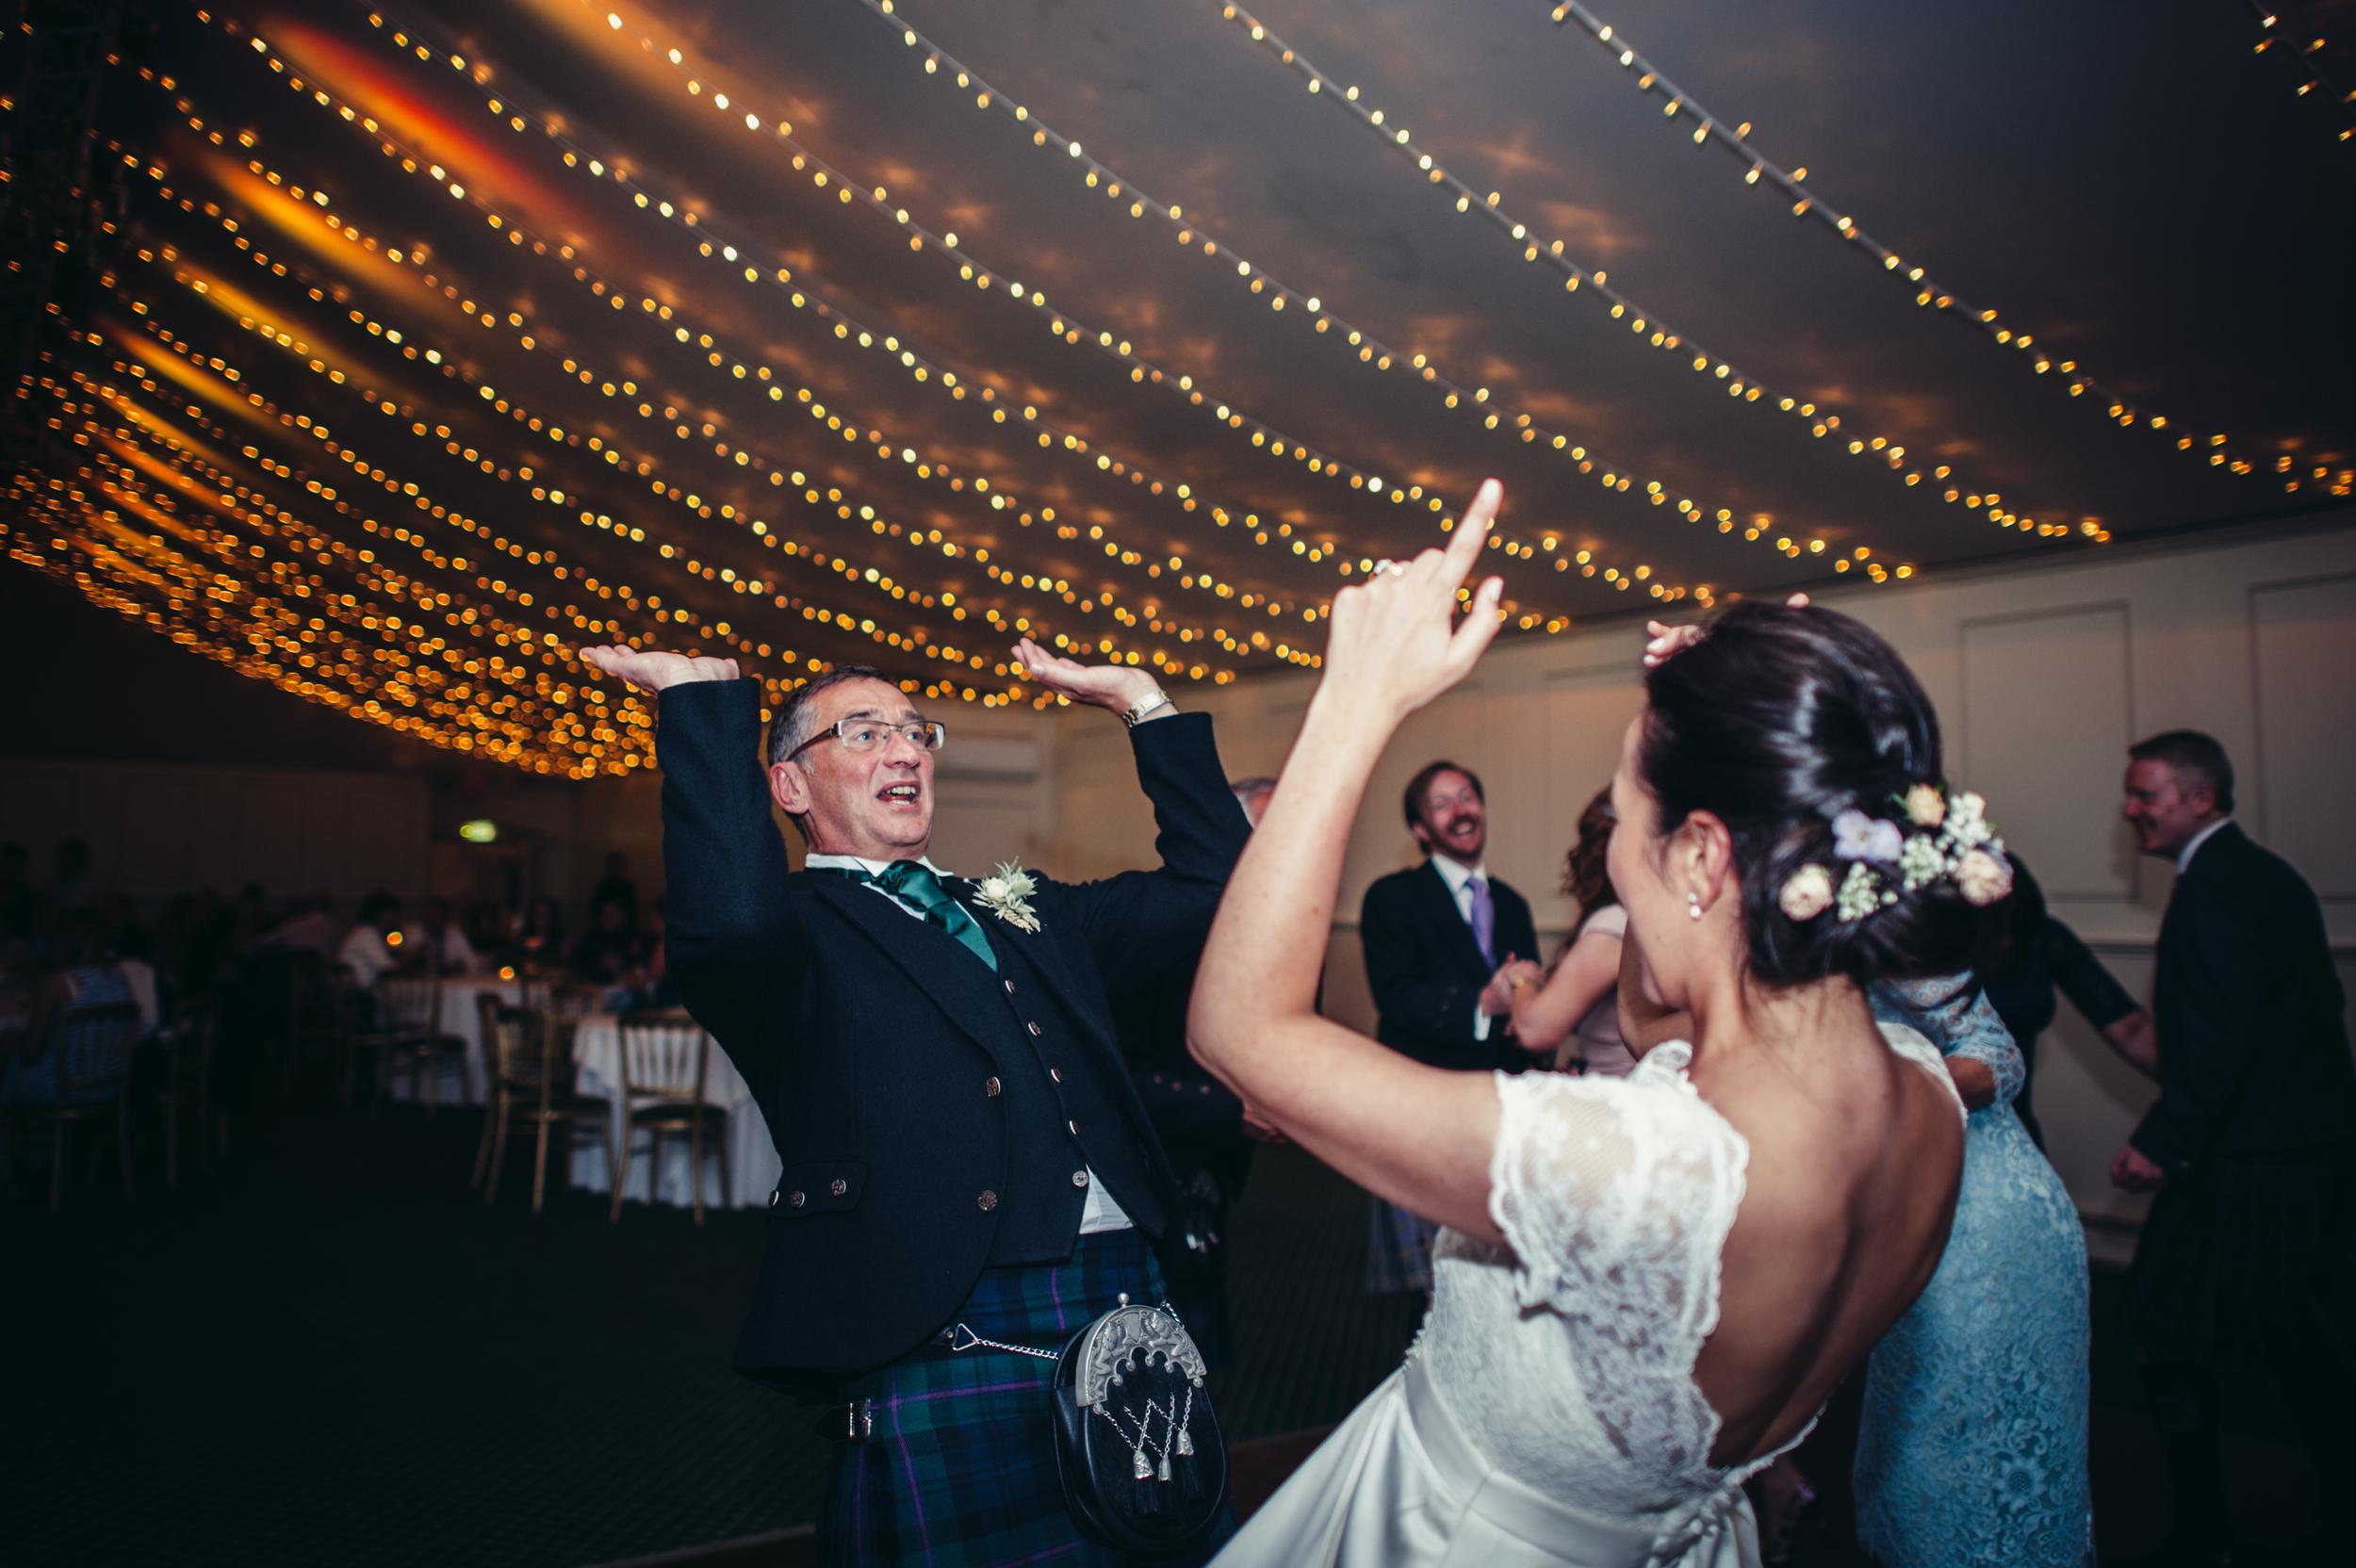 0188-lisa-devine-alternative-creative-wedding-photography-glasgow-edinburgh.JPG